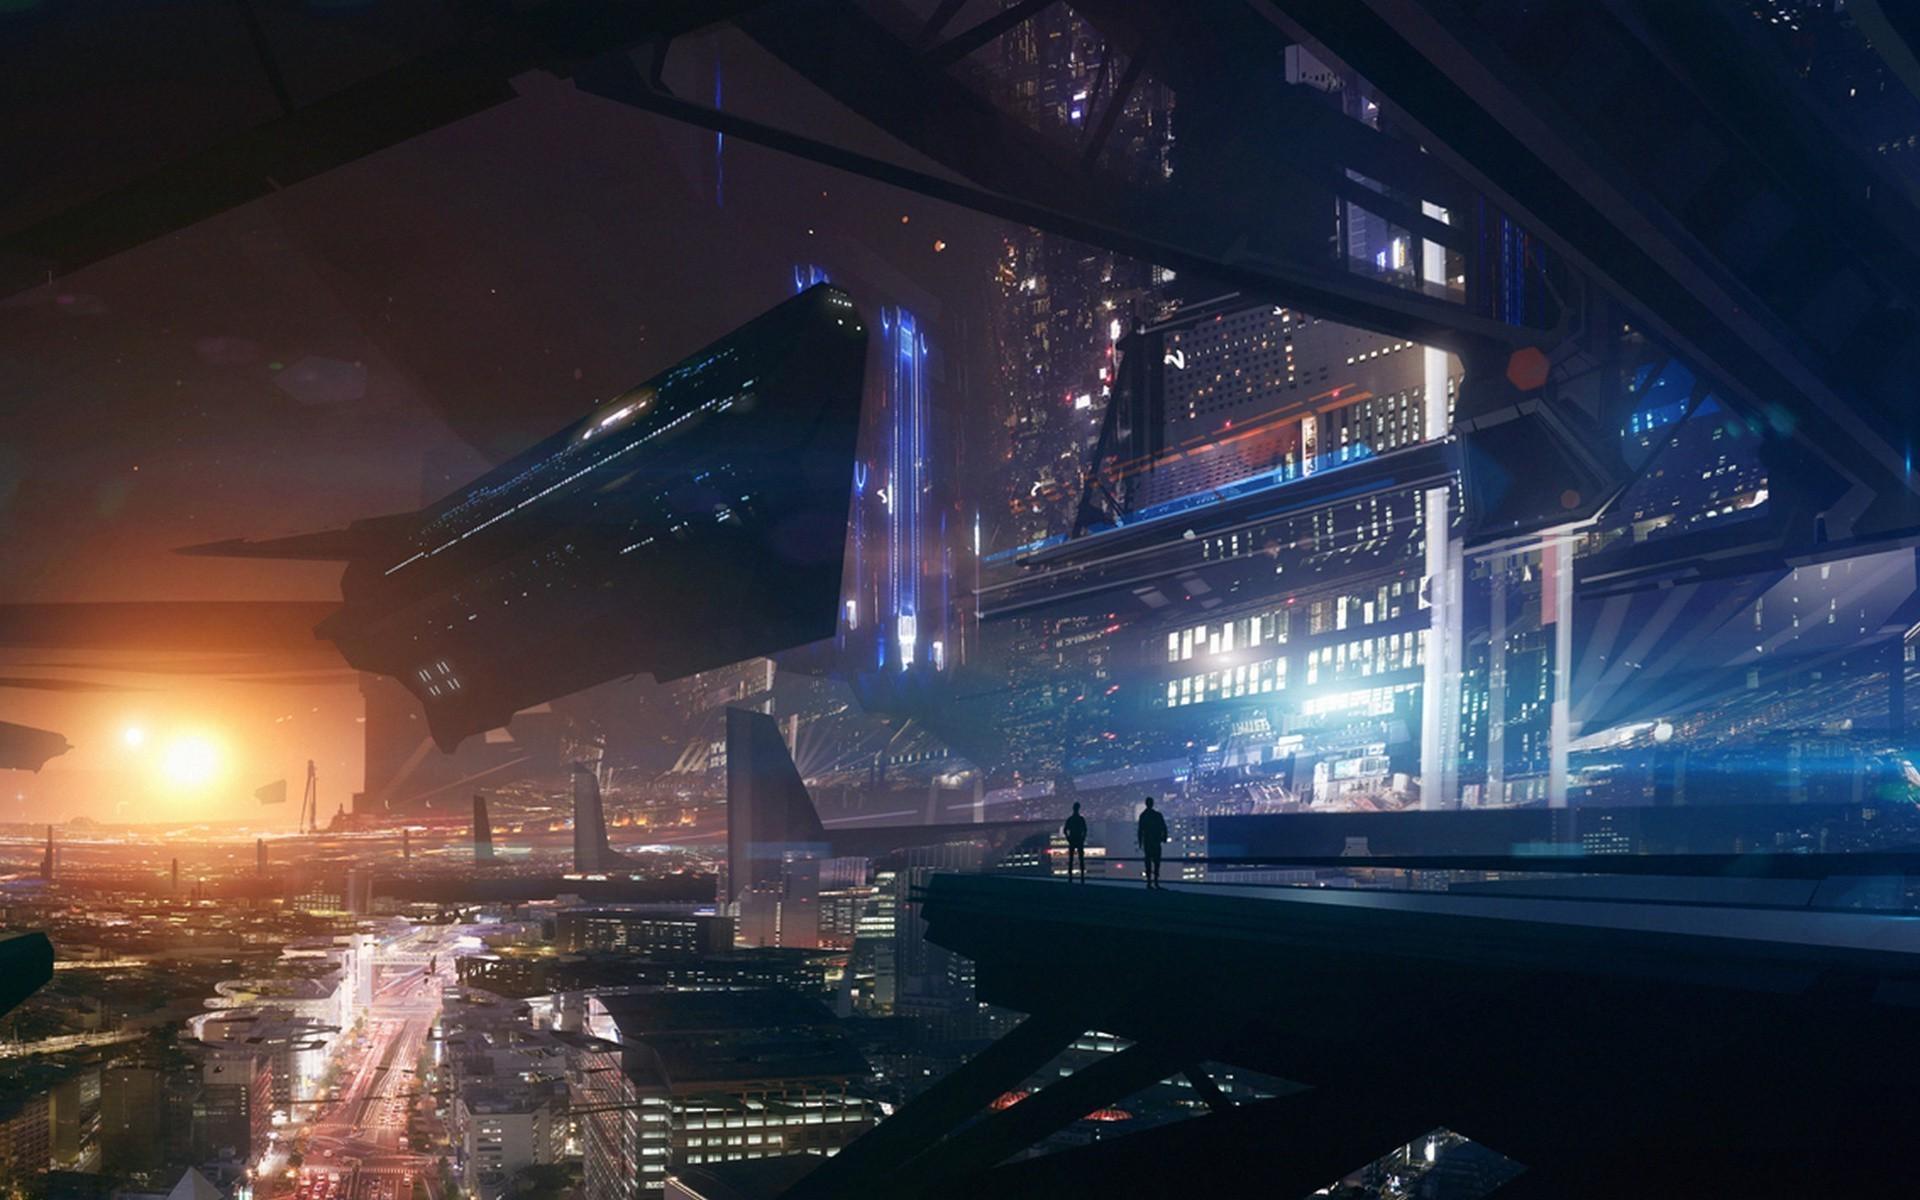 Gravity Falls Wallpaper Full Hd Future City Lights Space Futuristic Spaceship Fantasy